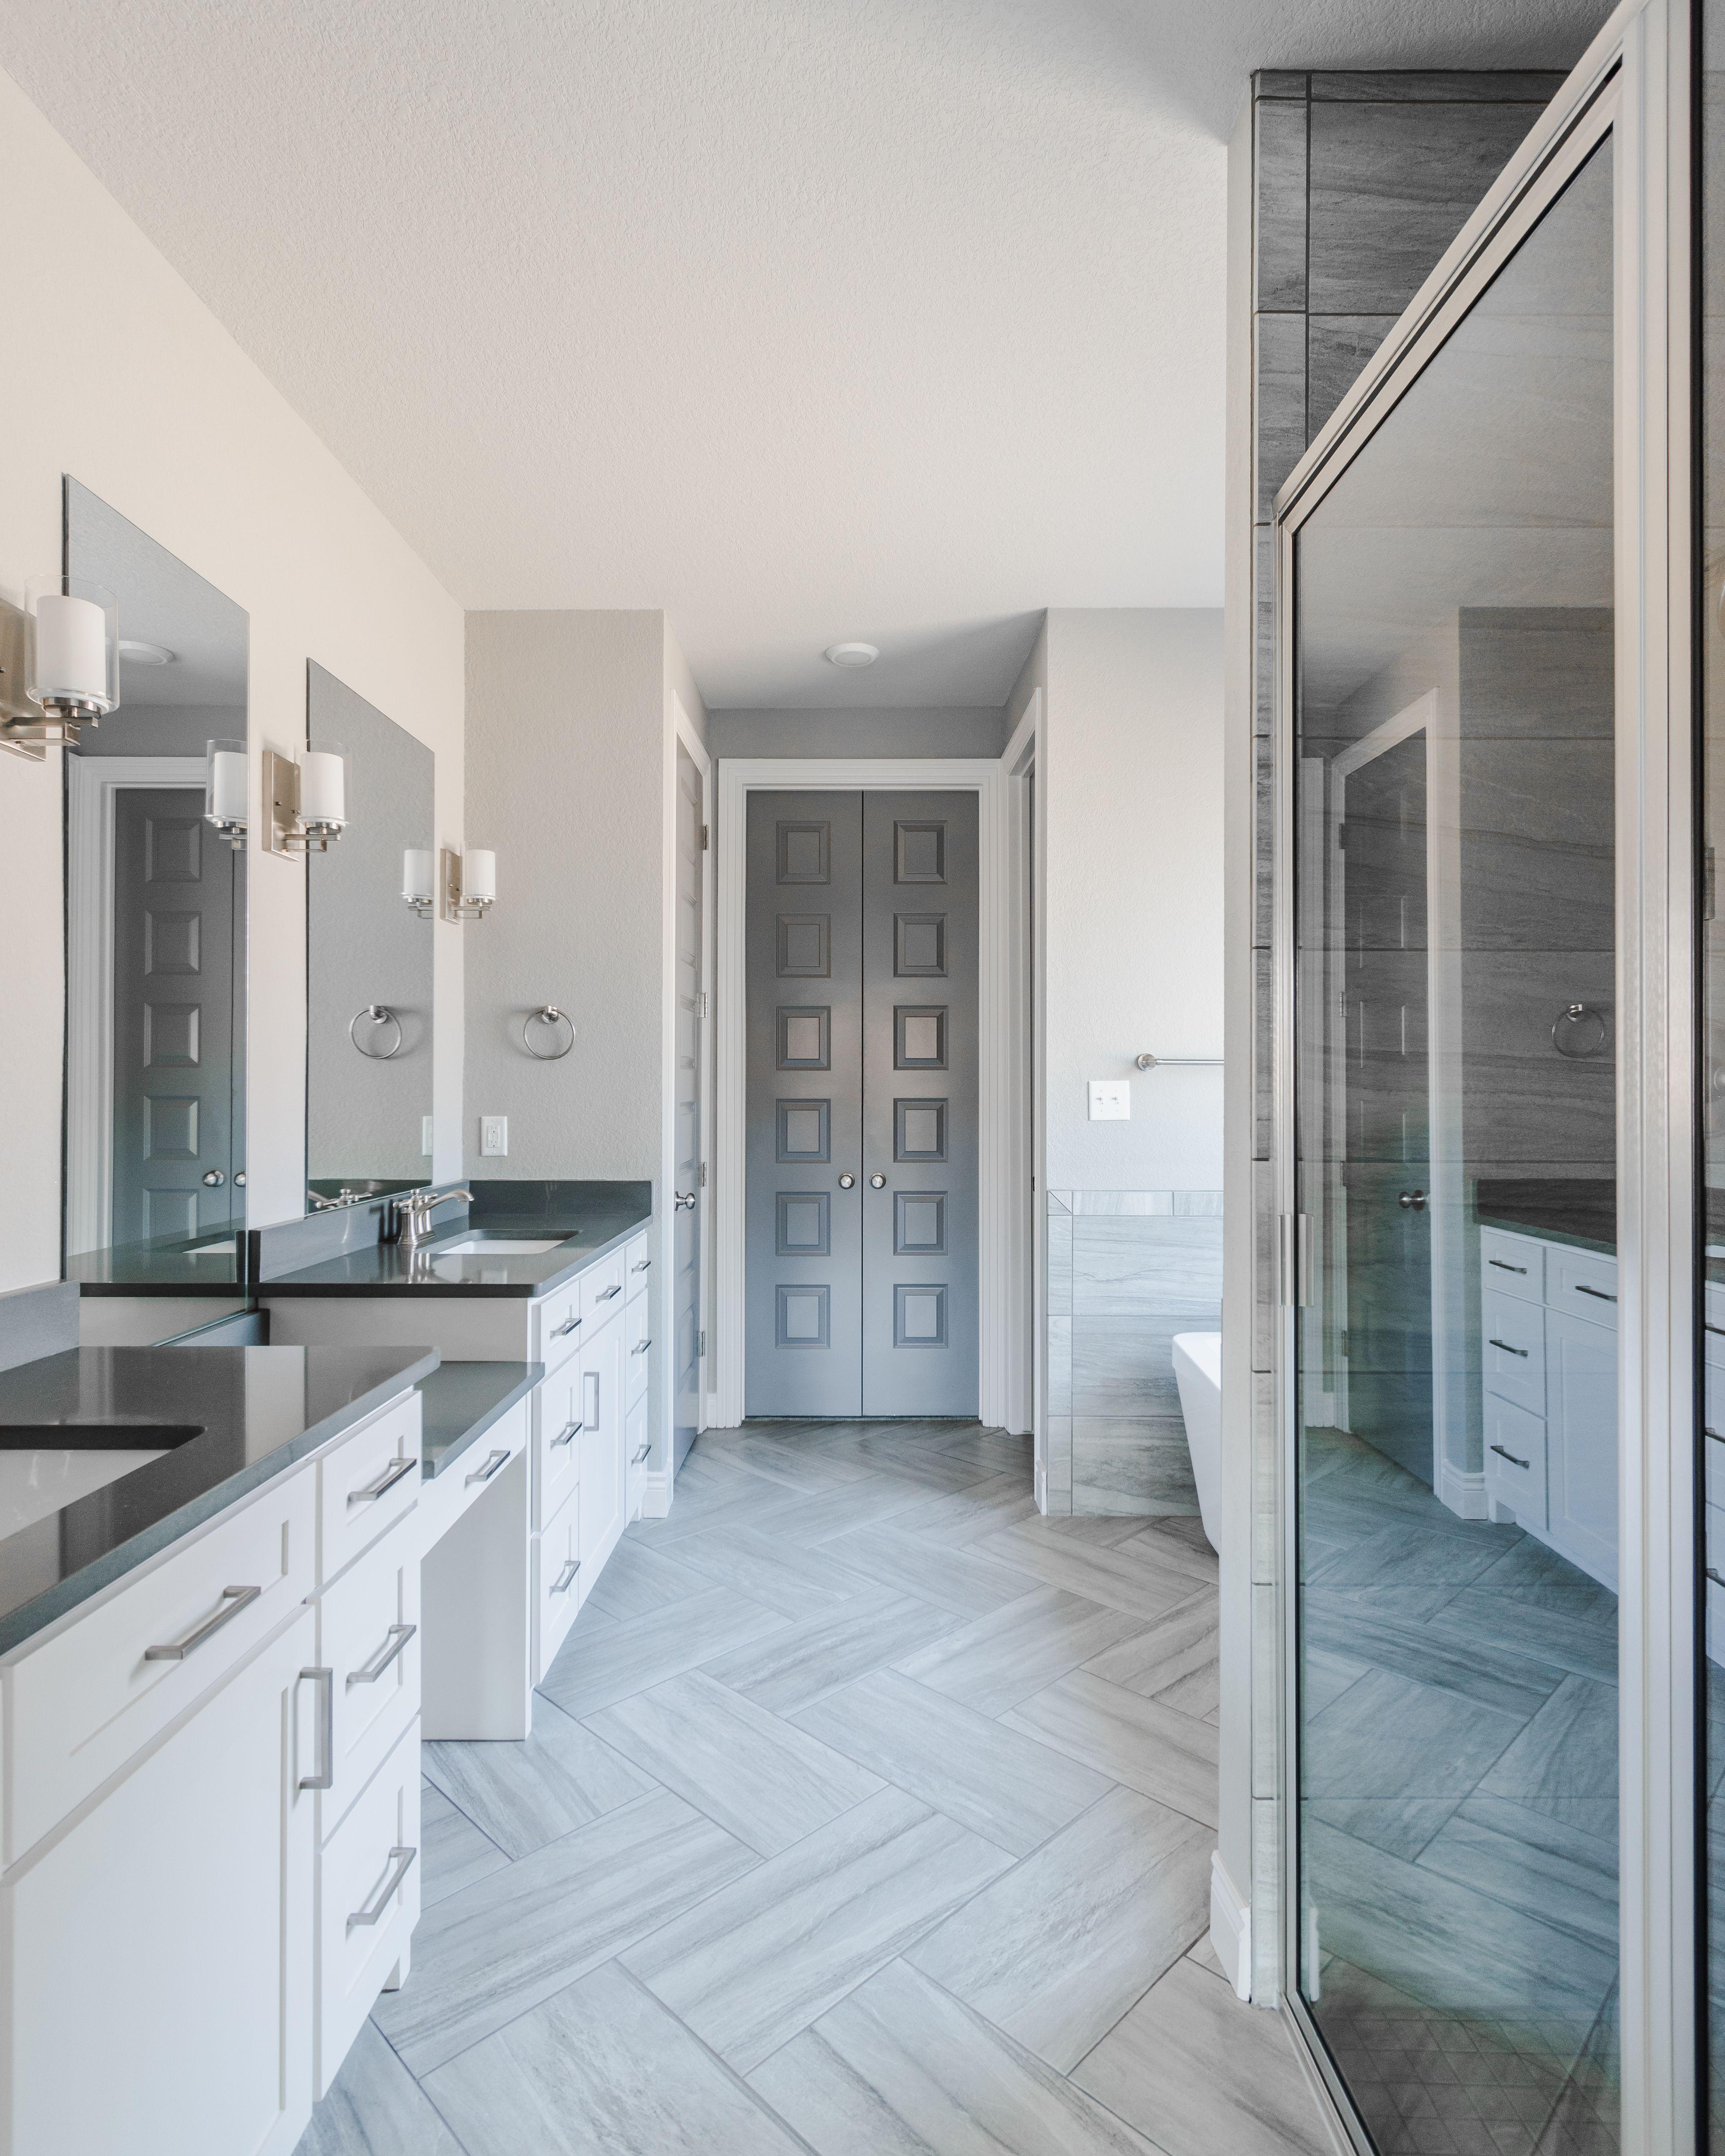 Gray Modern Master Bathroom With Herringbone Tile Floor Herringbone Tile Floors Modern Master Bathroom Herringbone Tile